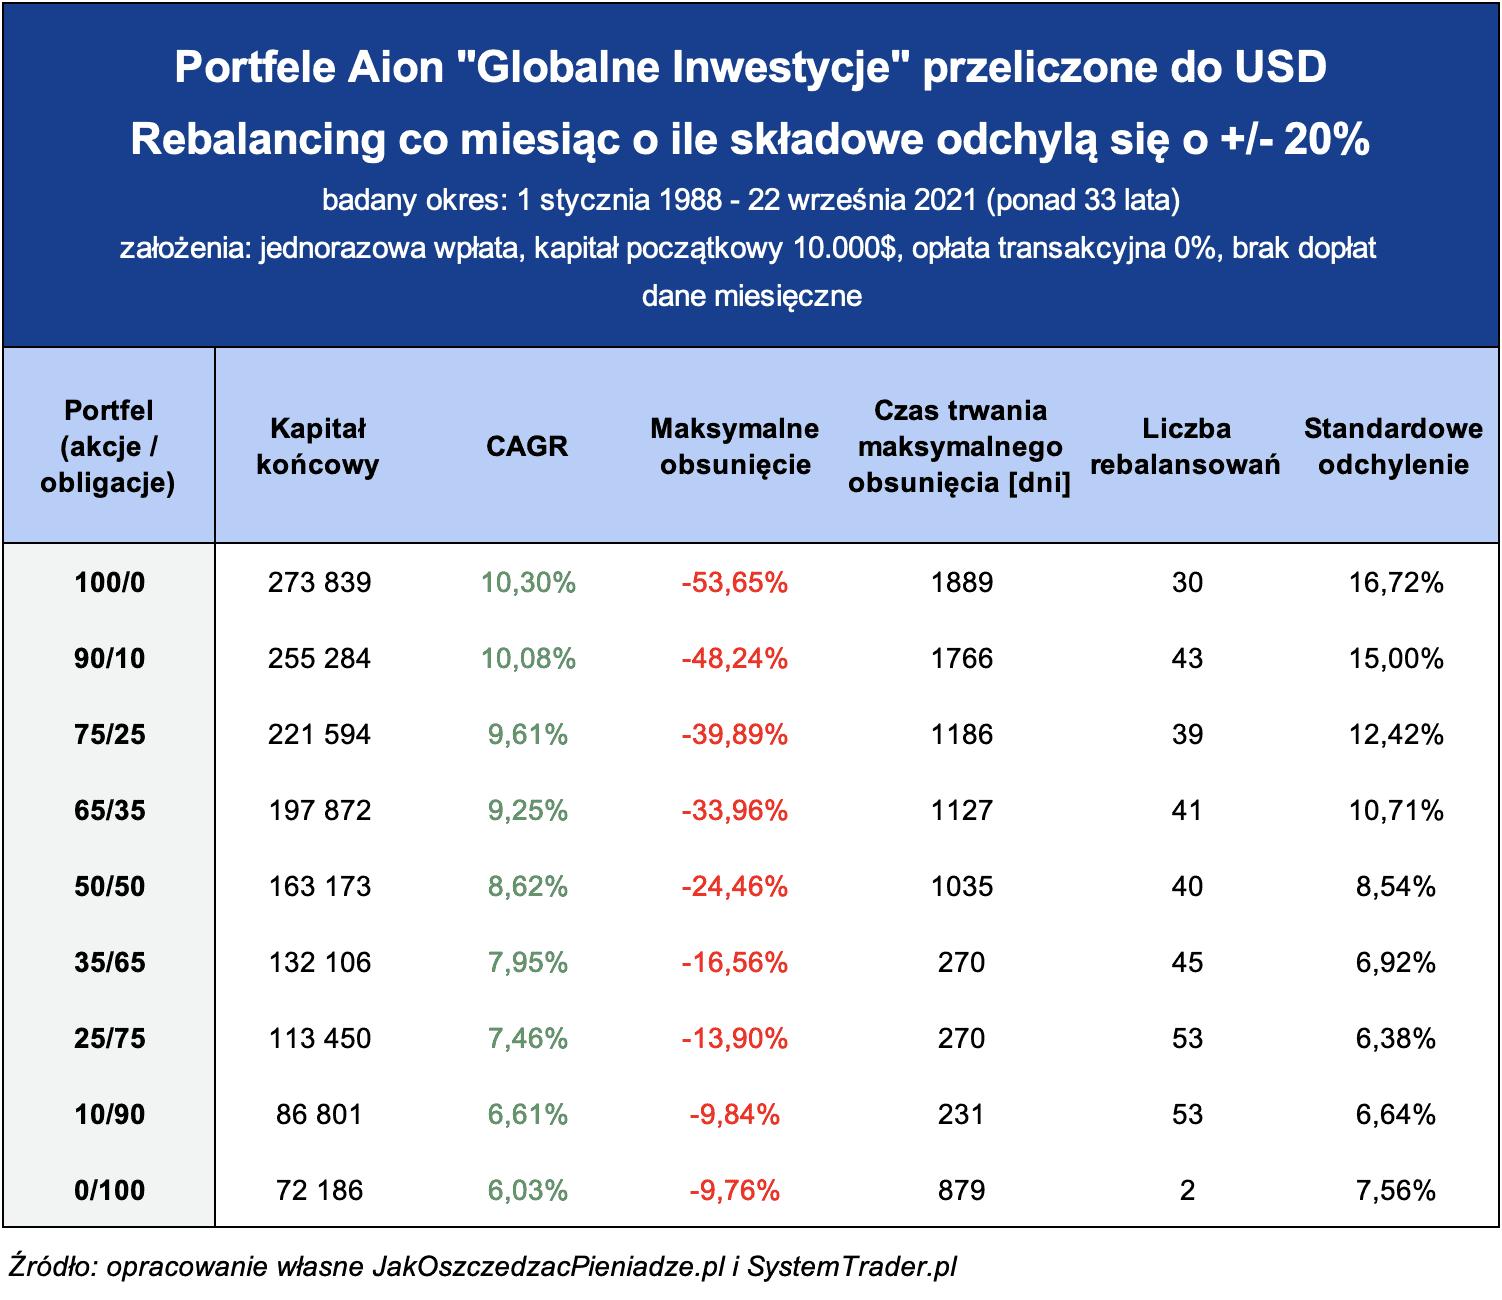 Aion Globalne Inwestycje USD rebalancing 20